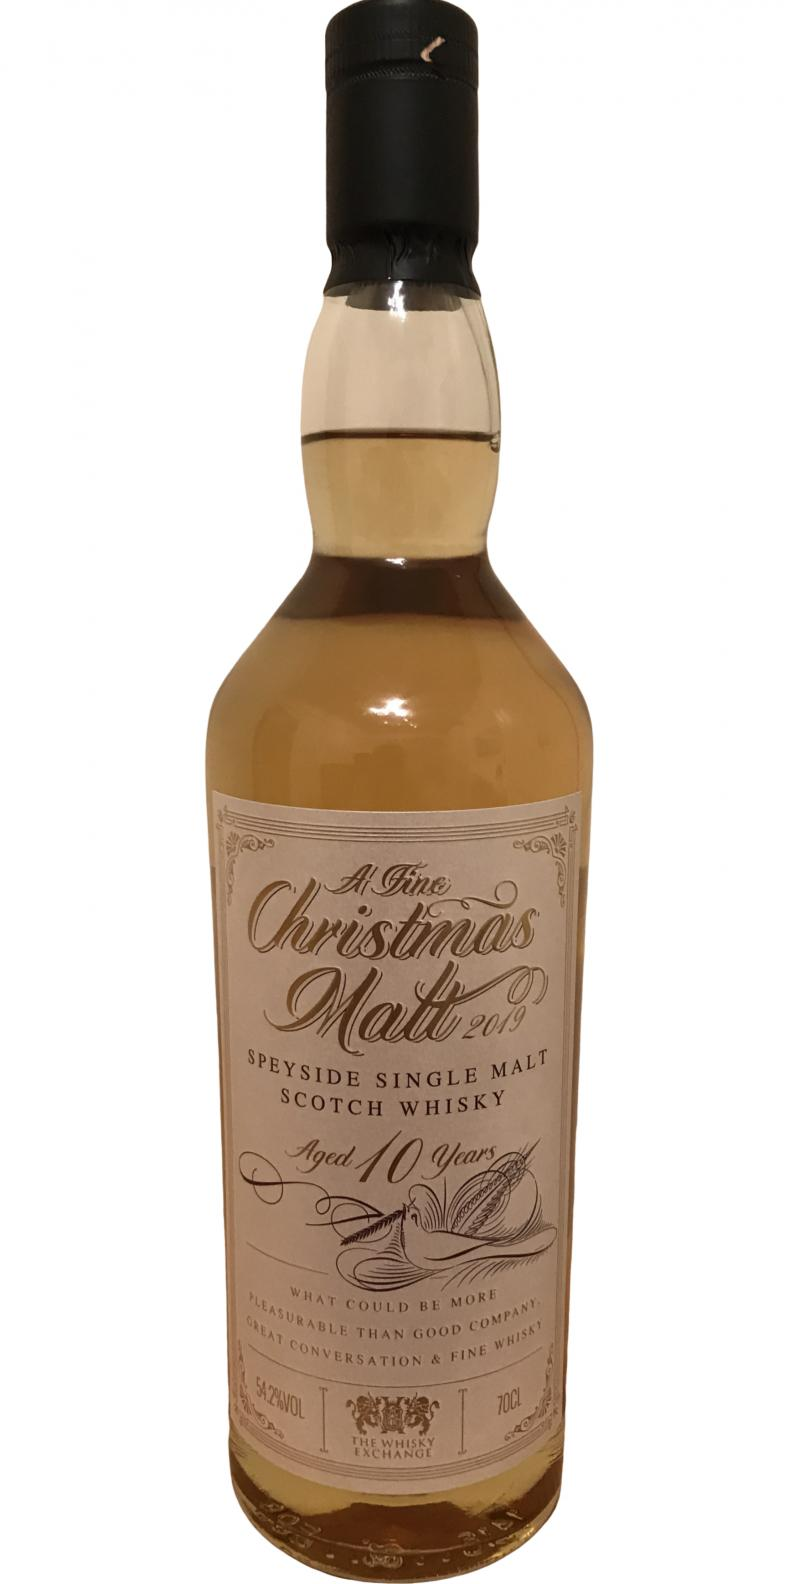 Speyside Single Malt Scotch Whisky 10-year-old ElD